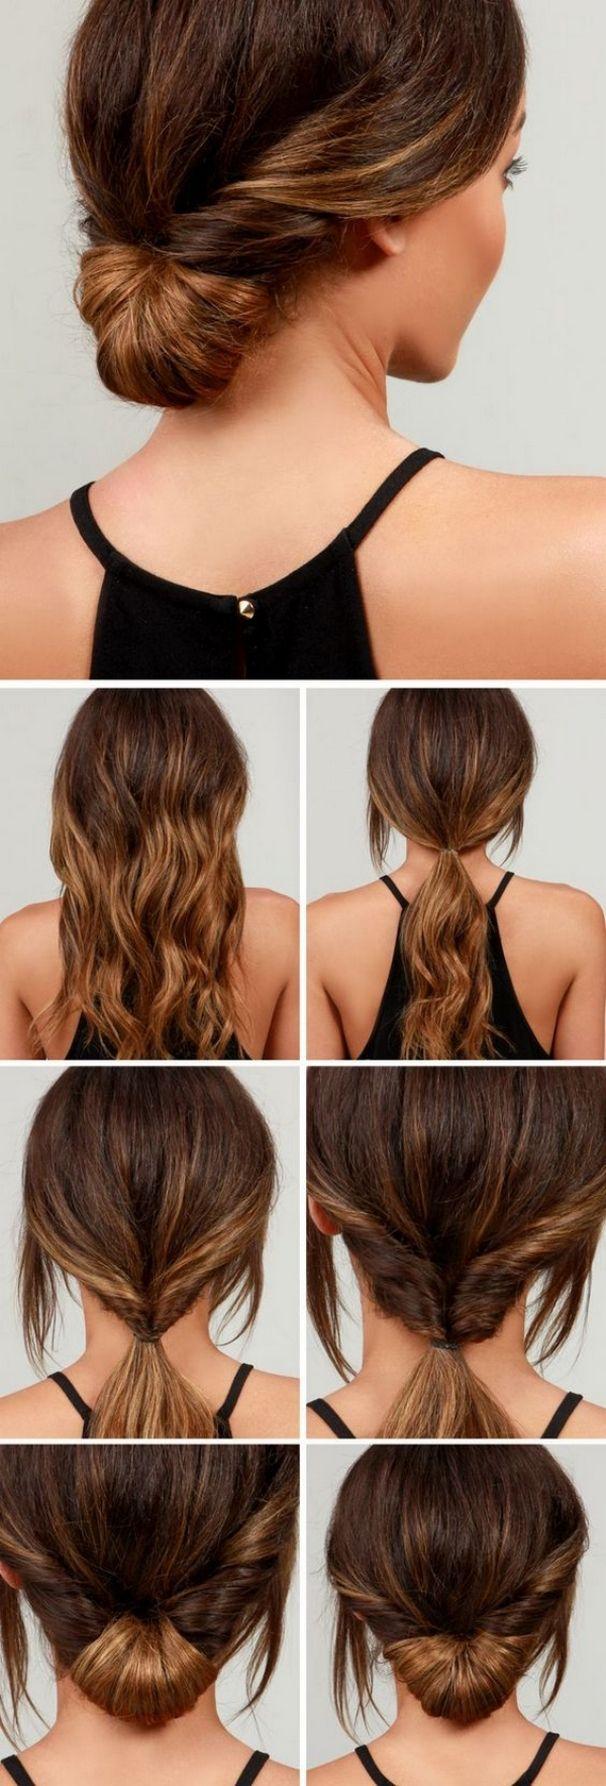 foto de 100+ Cute Easy Summer Hairstyles For Long Hair Chignon